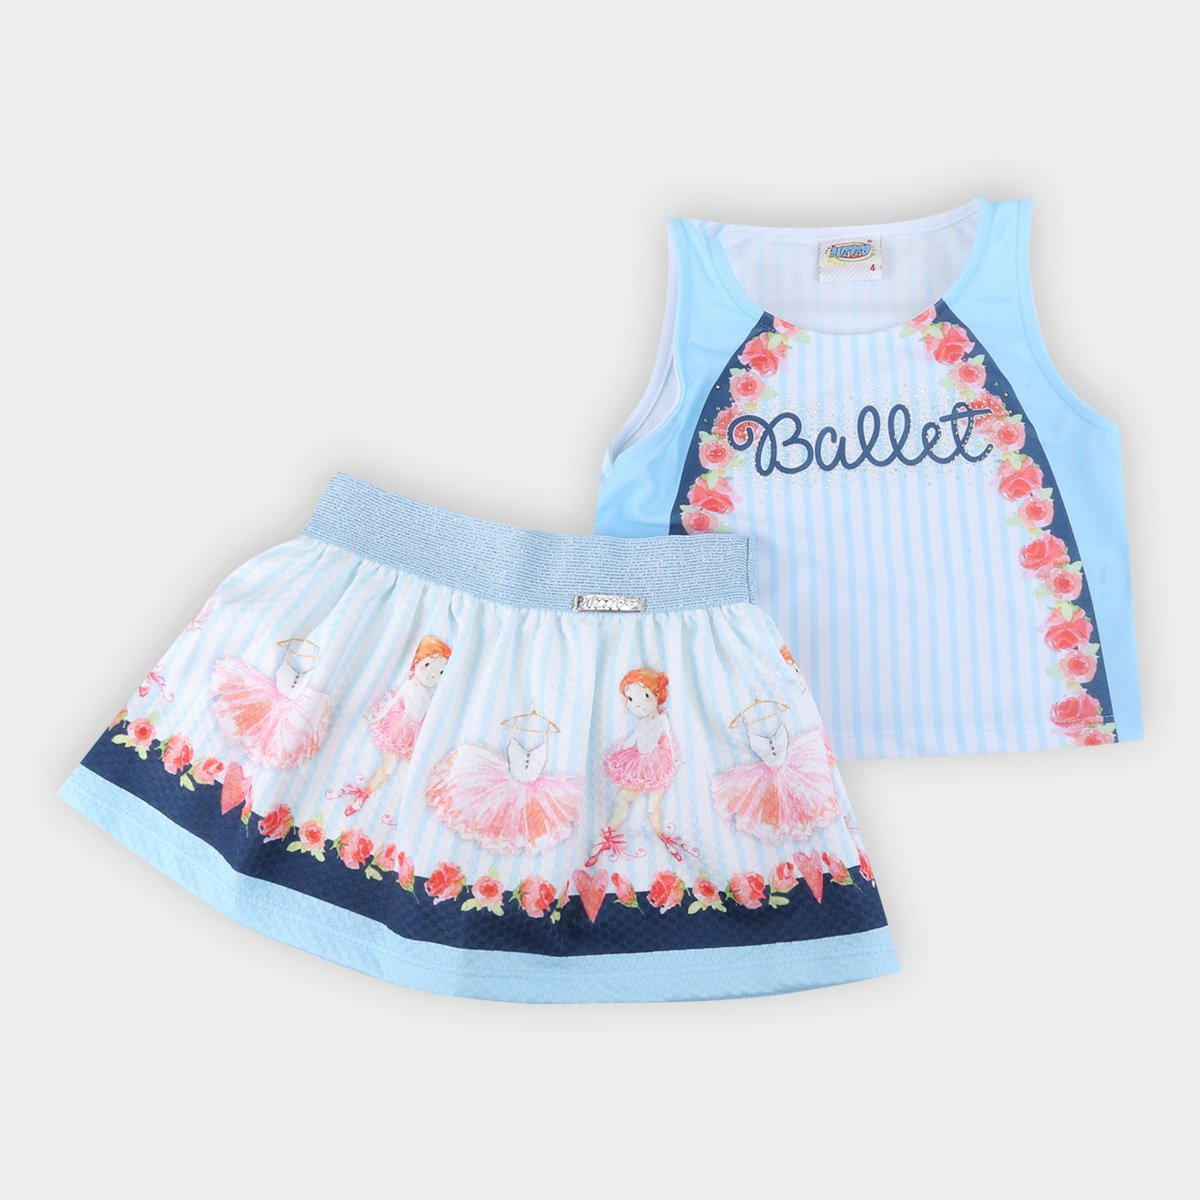 Conjunto Infantil Duzizo Bailarina Regata Cropped + Short Saia Feminino